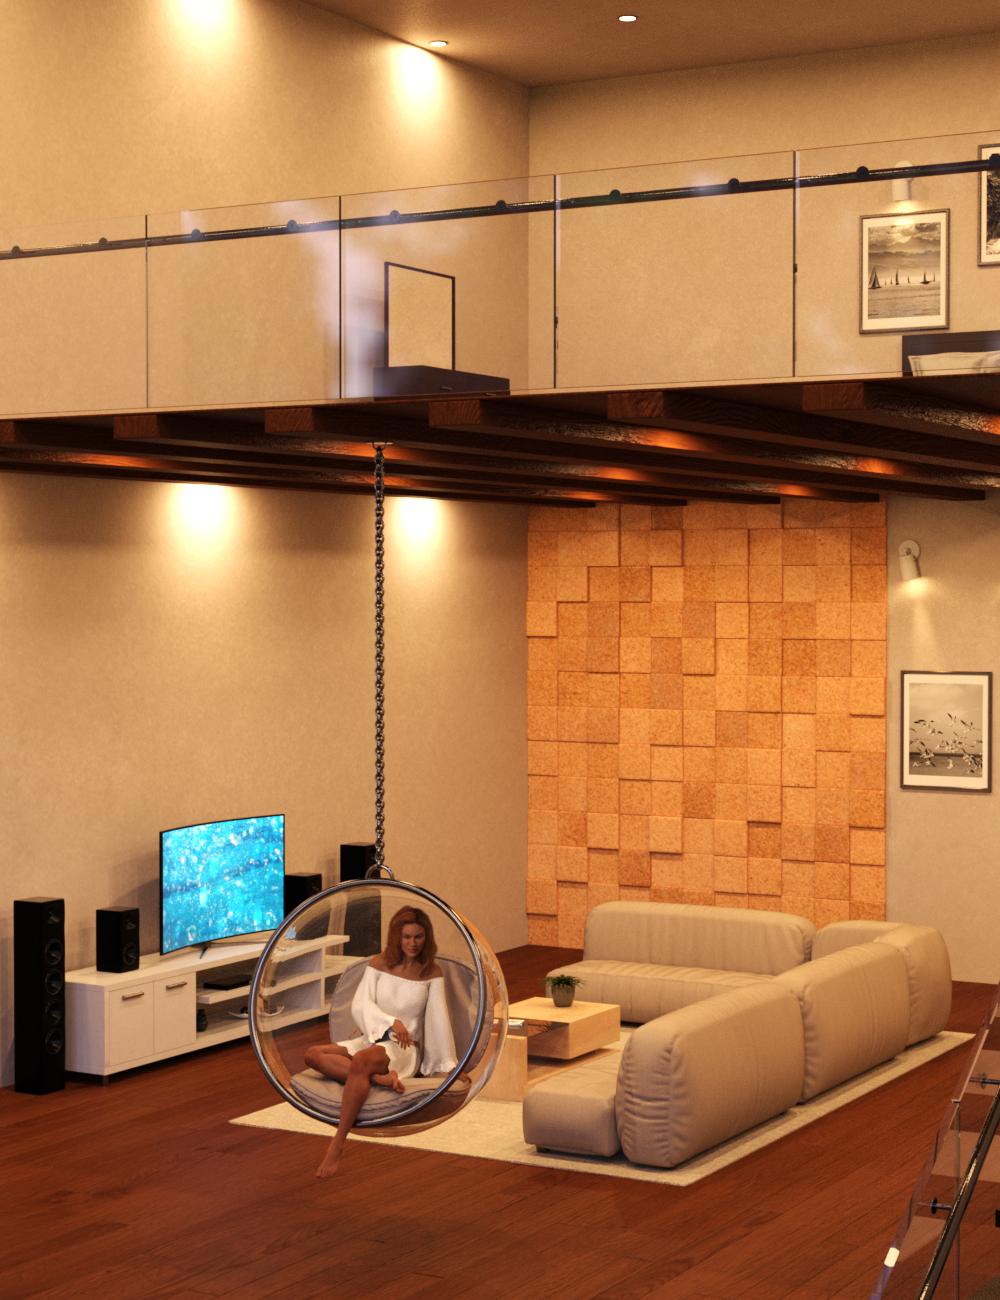 Duplex Living by: Charlie, 3D Models by Daz 3D